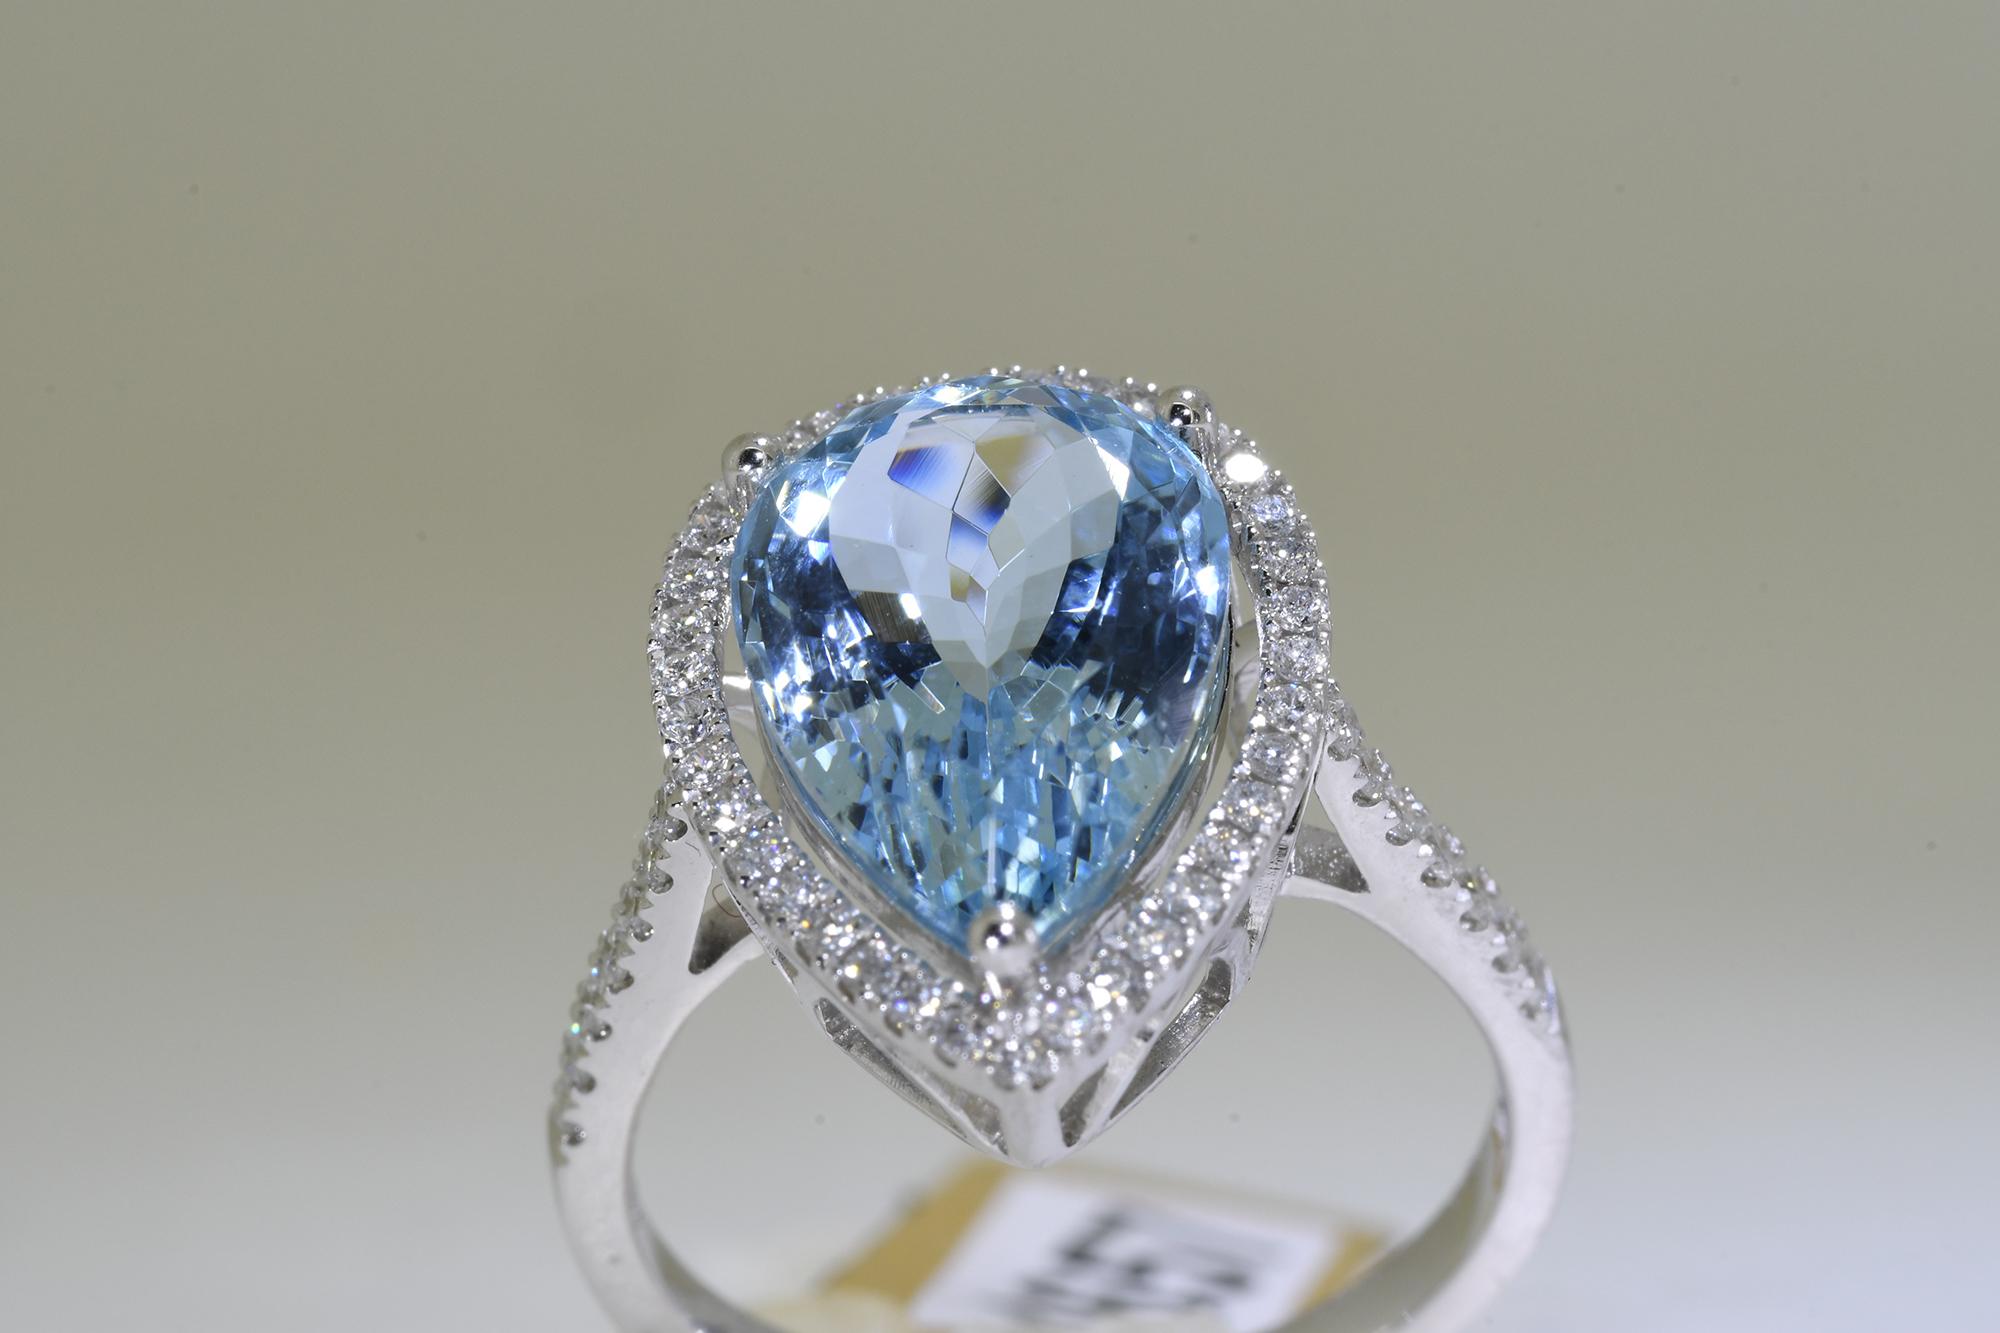 Aquamarine & Diamond Ring - Image 4 of 5